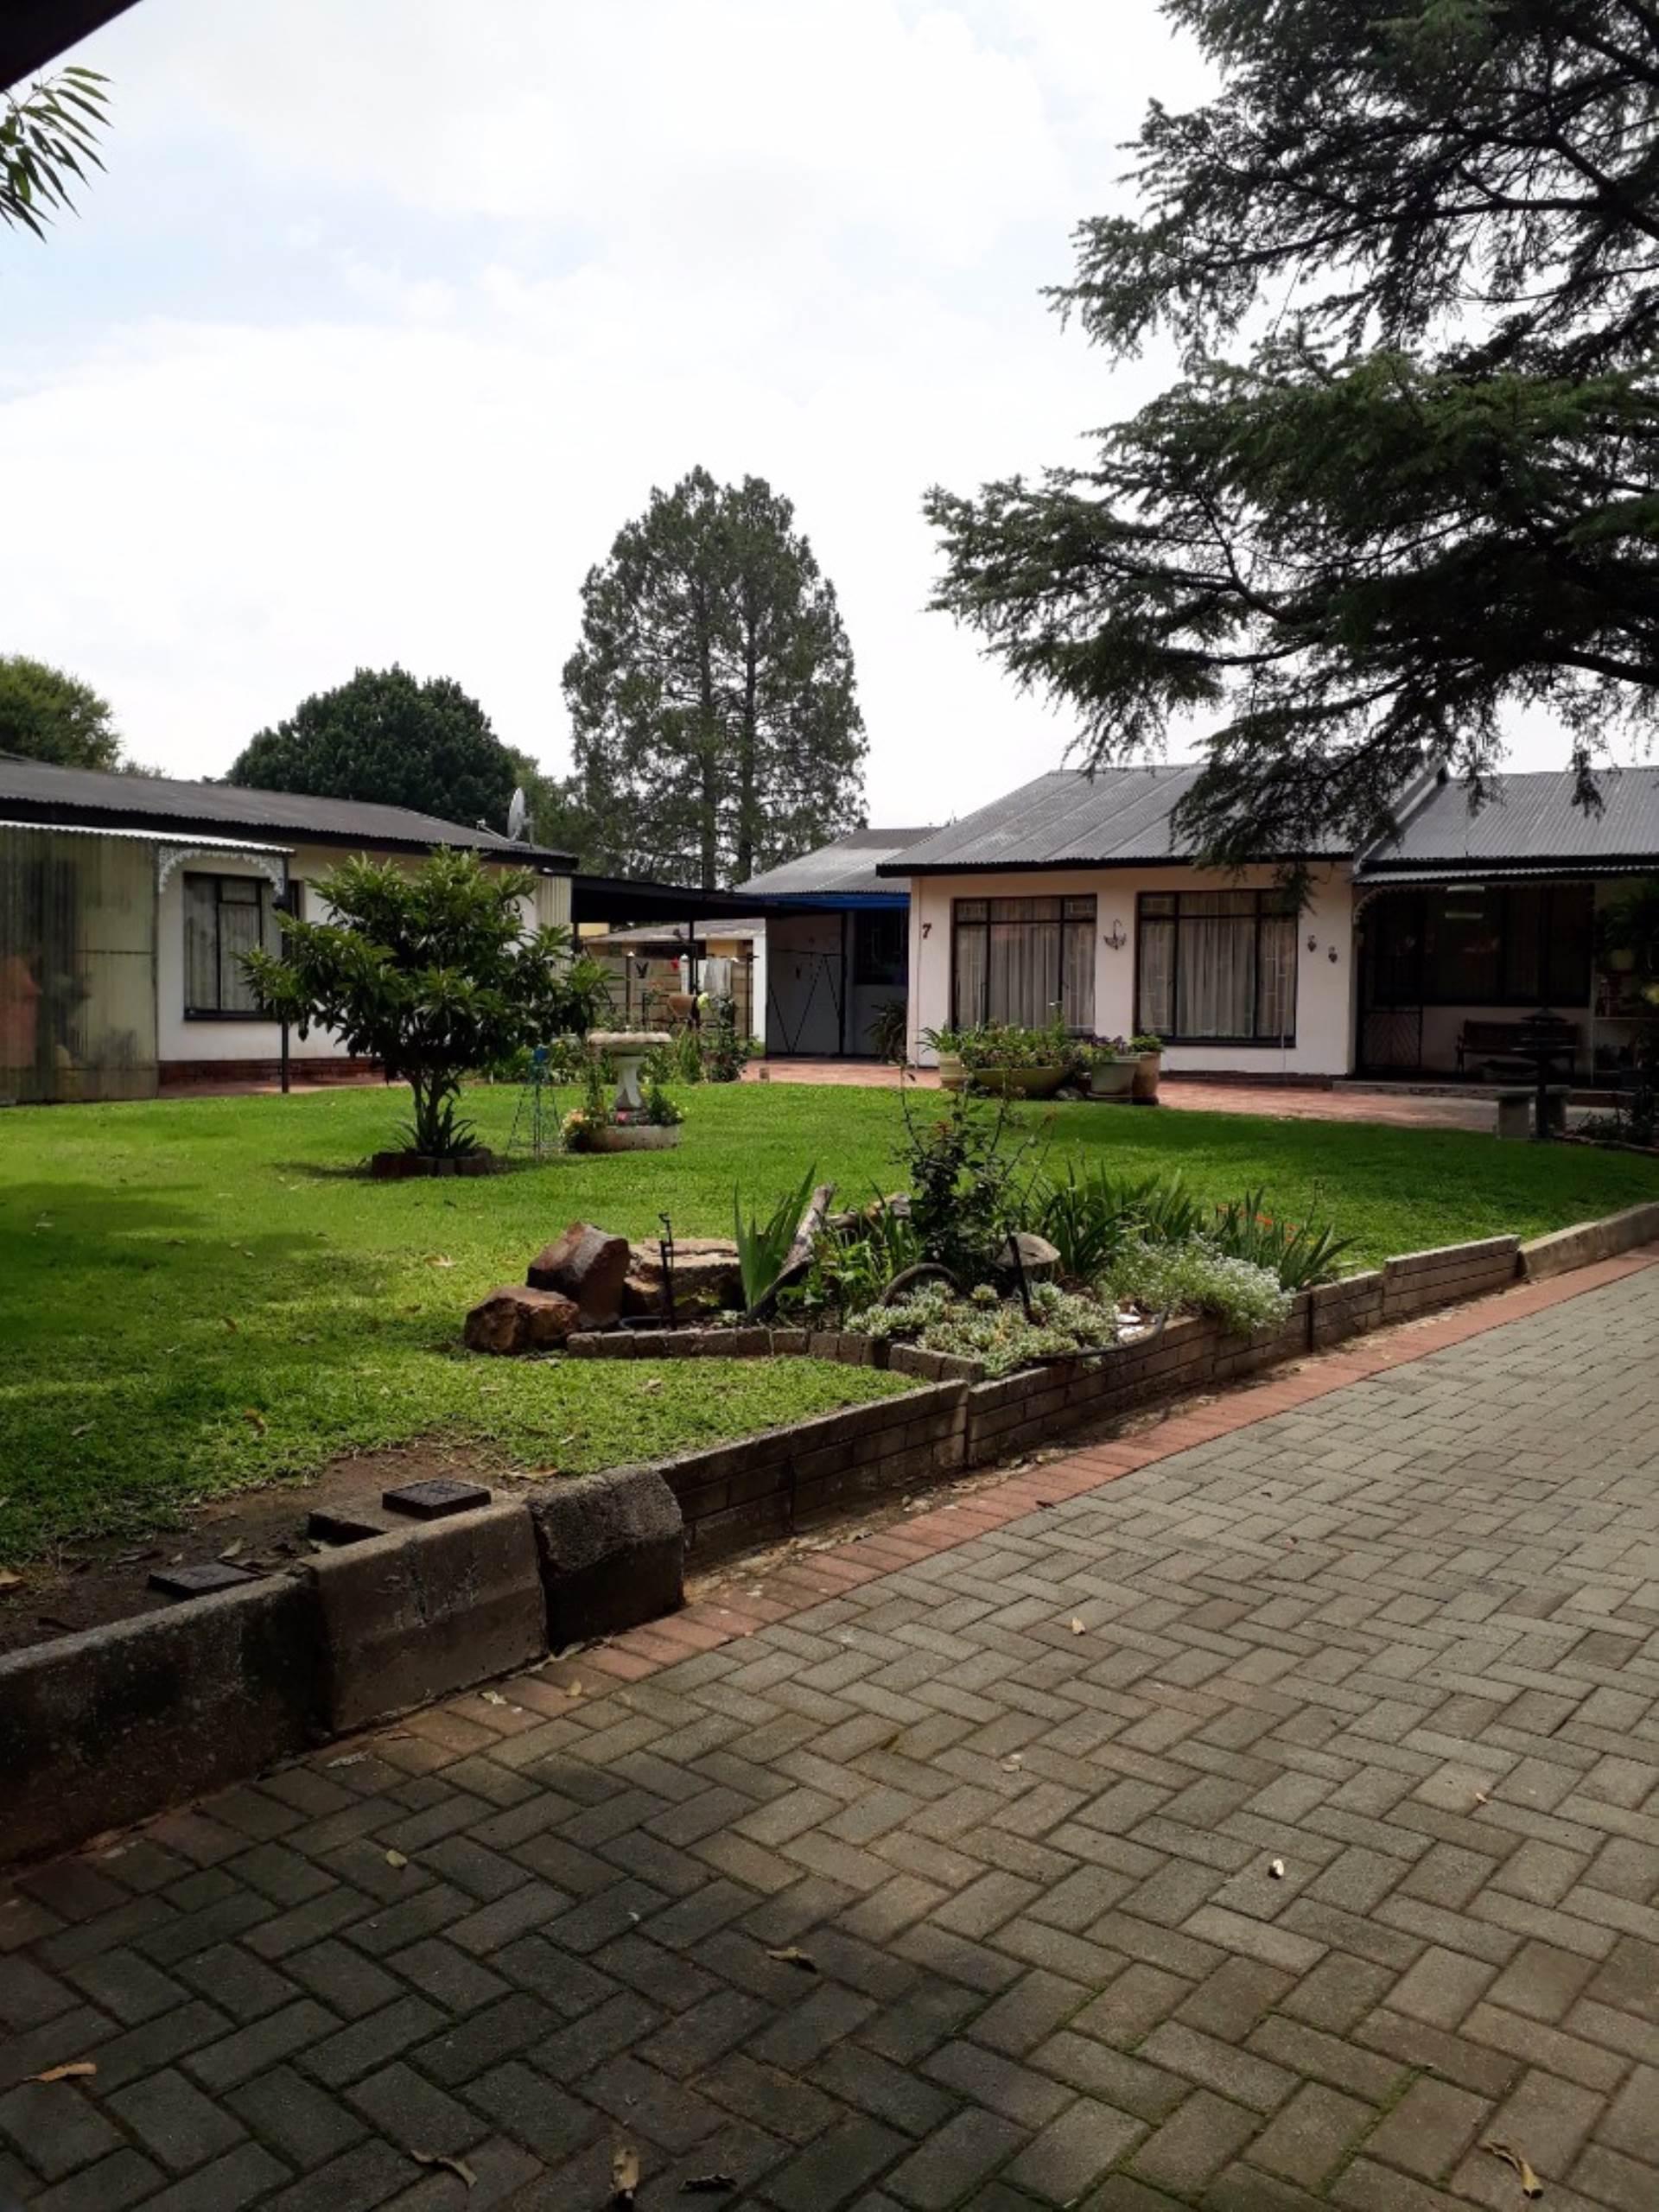 3 BedroomHouse For Sale In Sasolburg